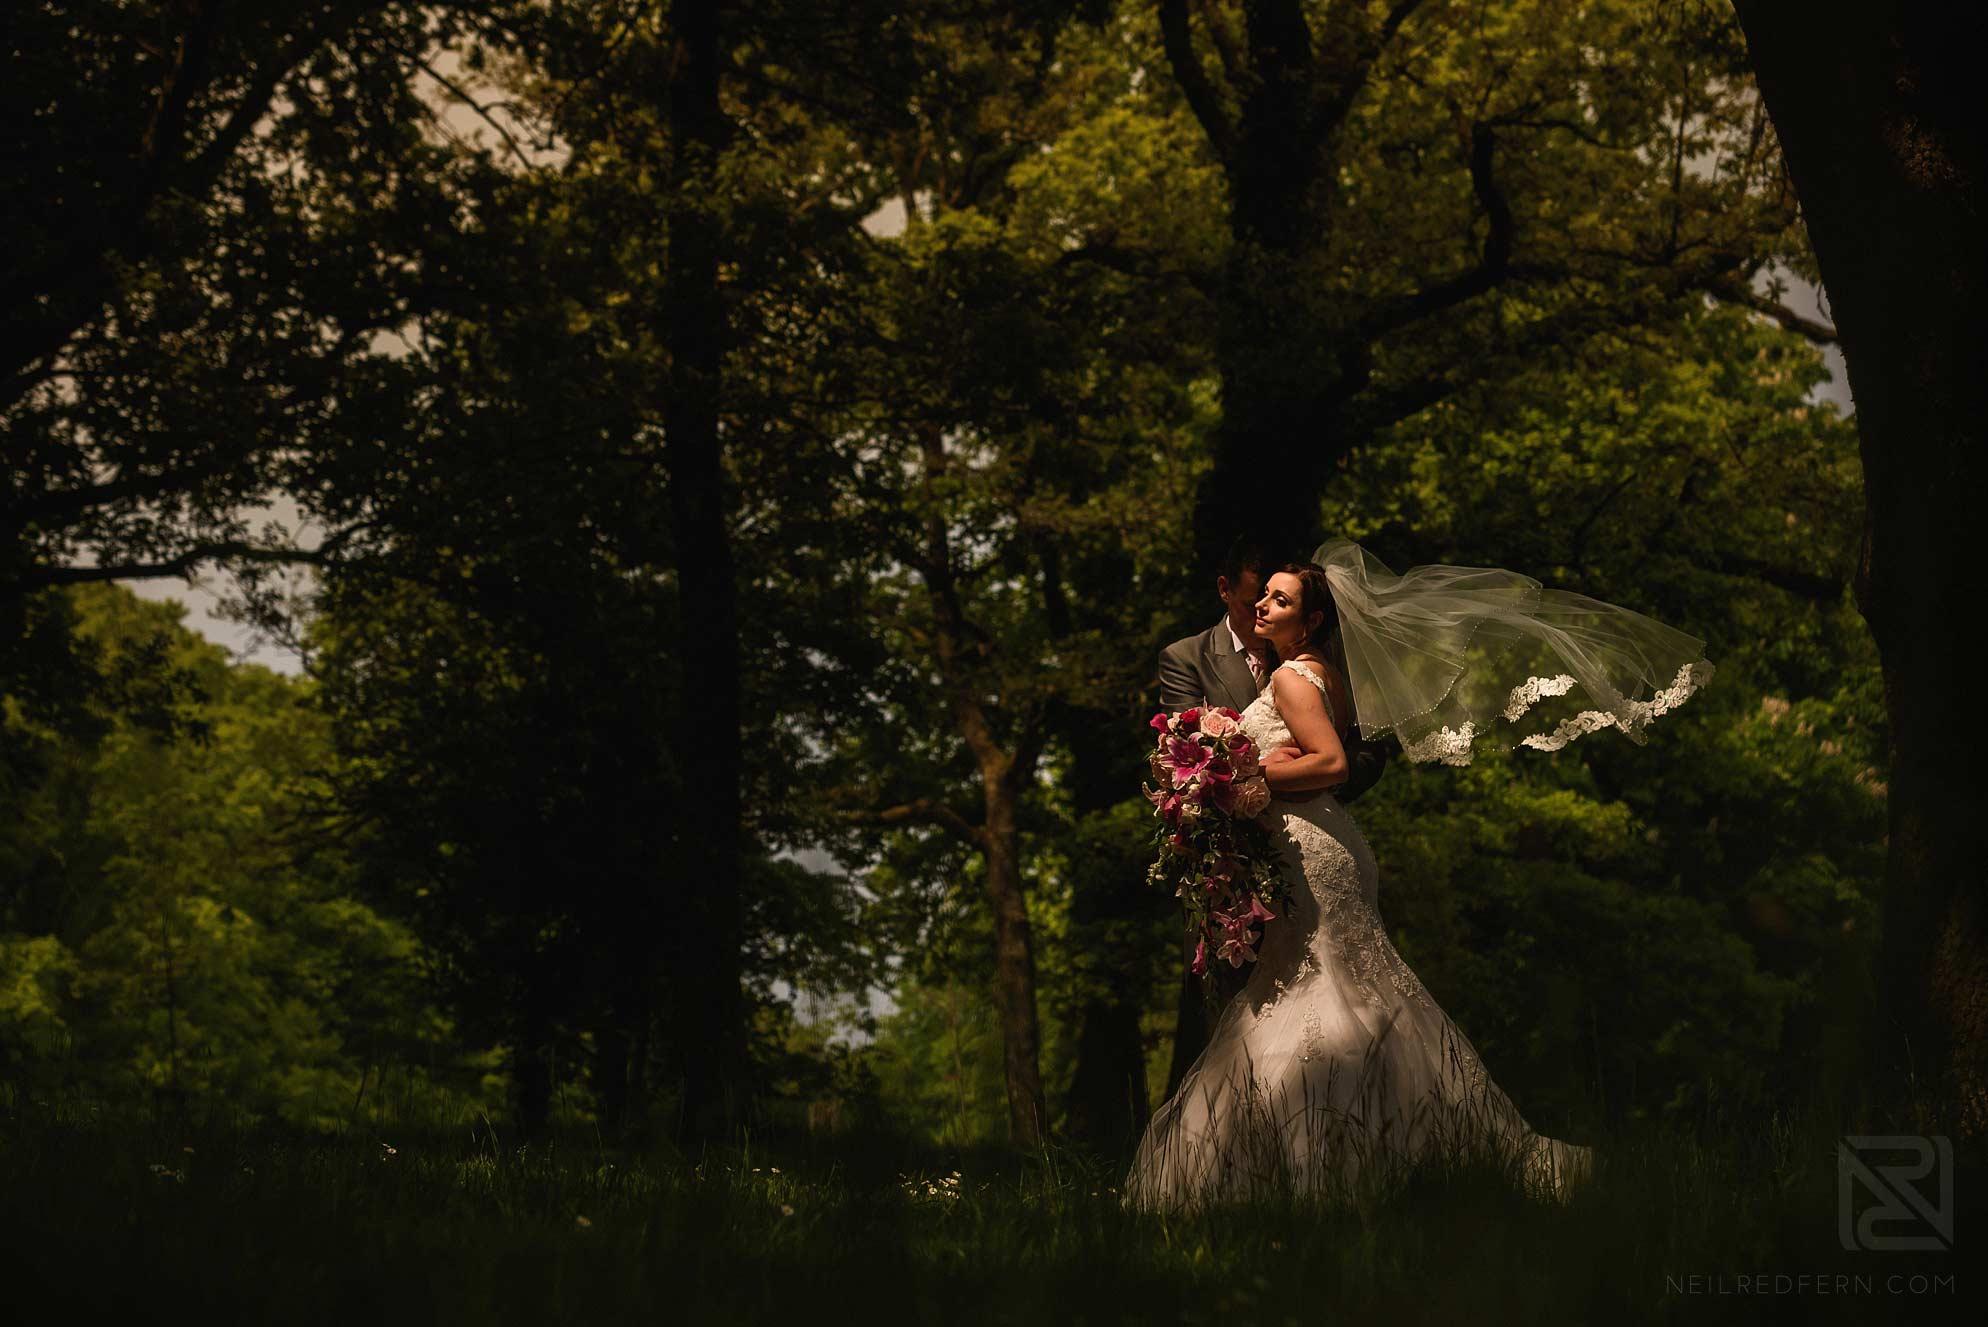 wedding photograph at the Metropole Hotel in llandrindod wells